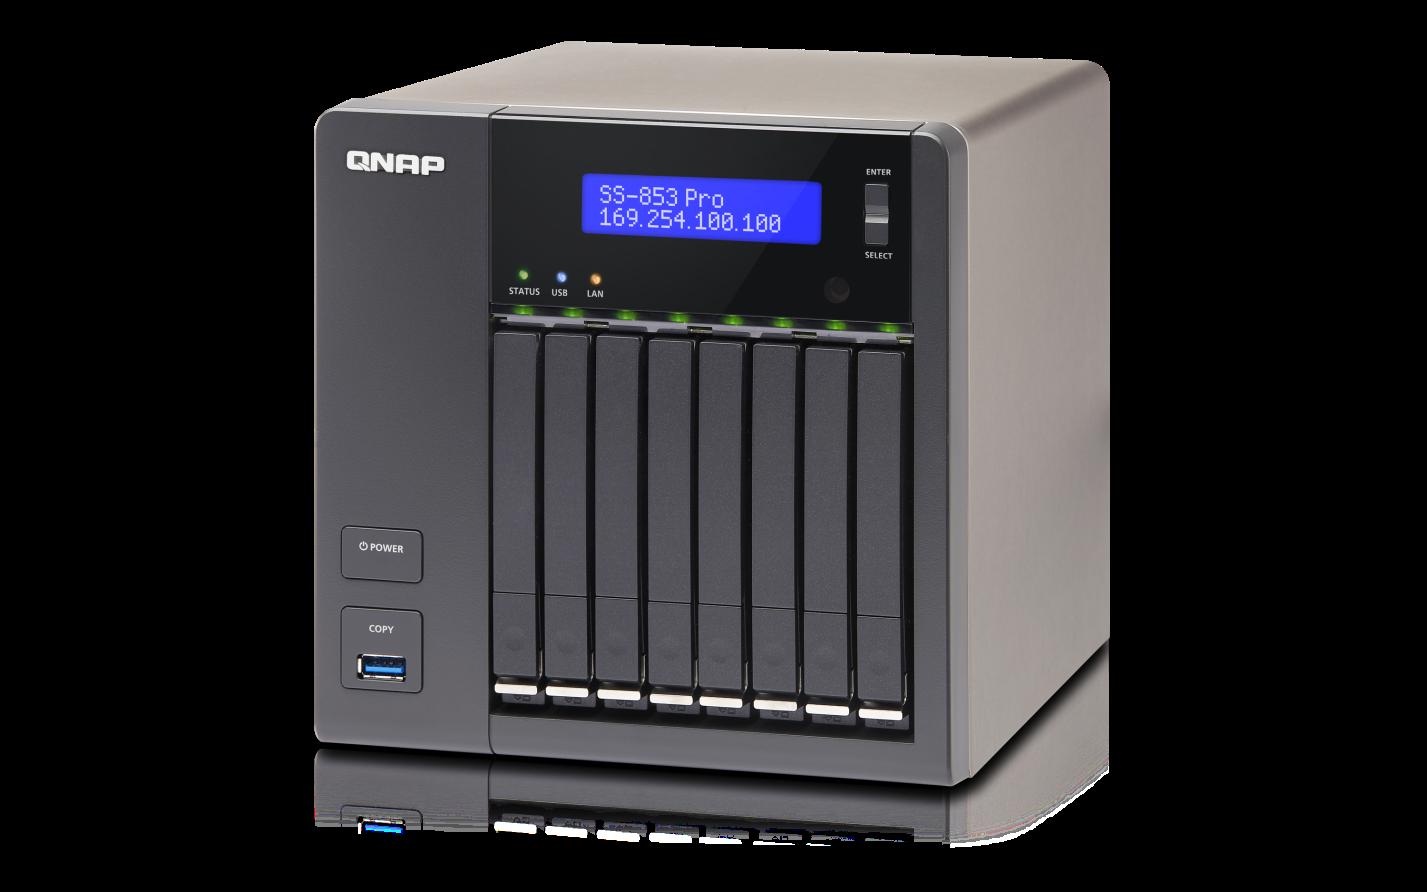 QNAP TS-853S-Pro (2,4G/4GB RAM/8xSATA)